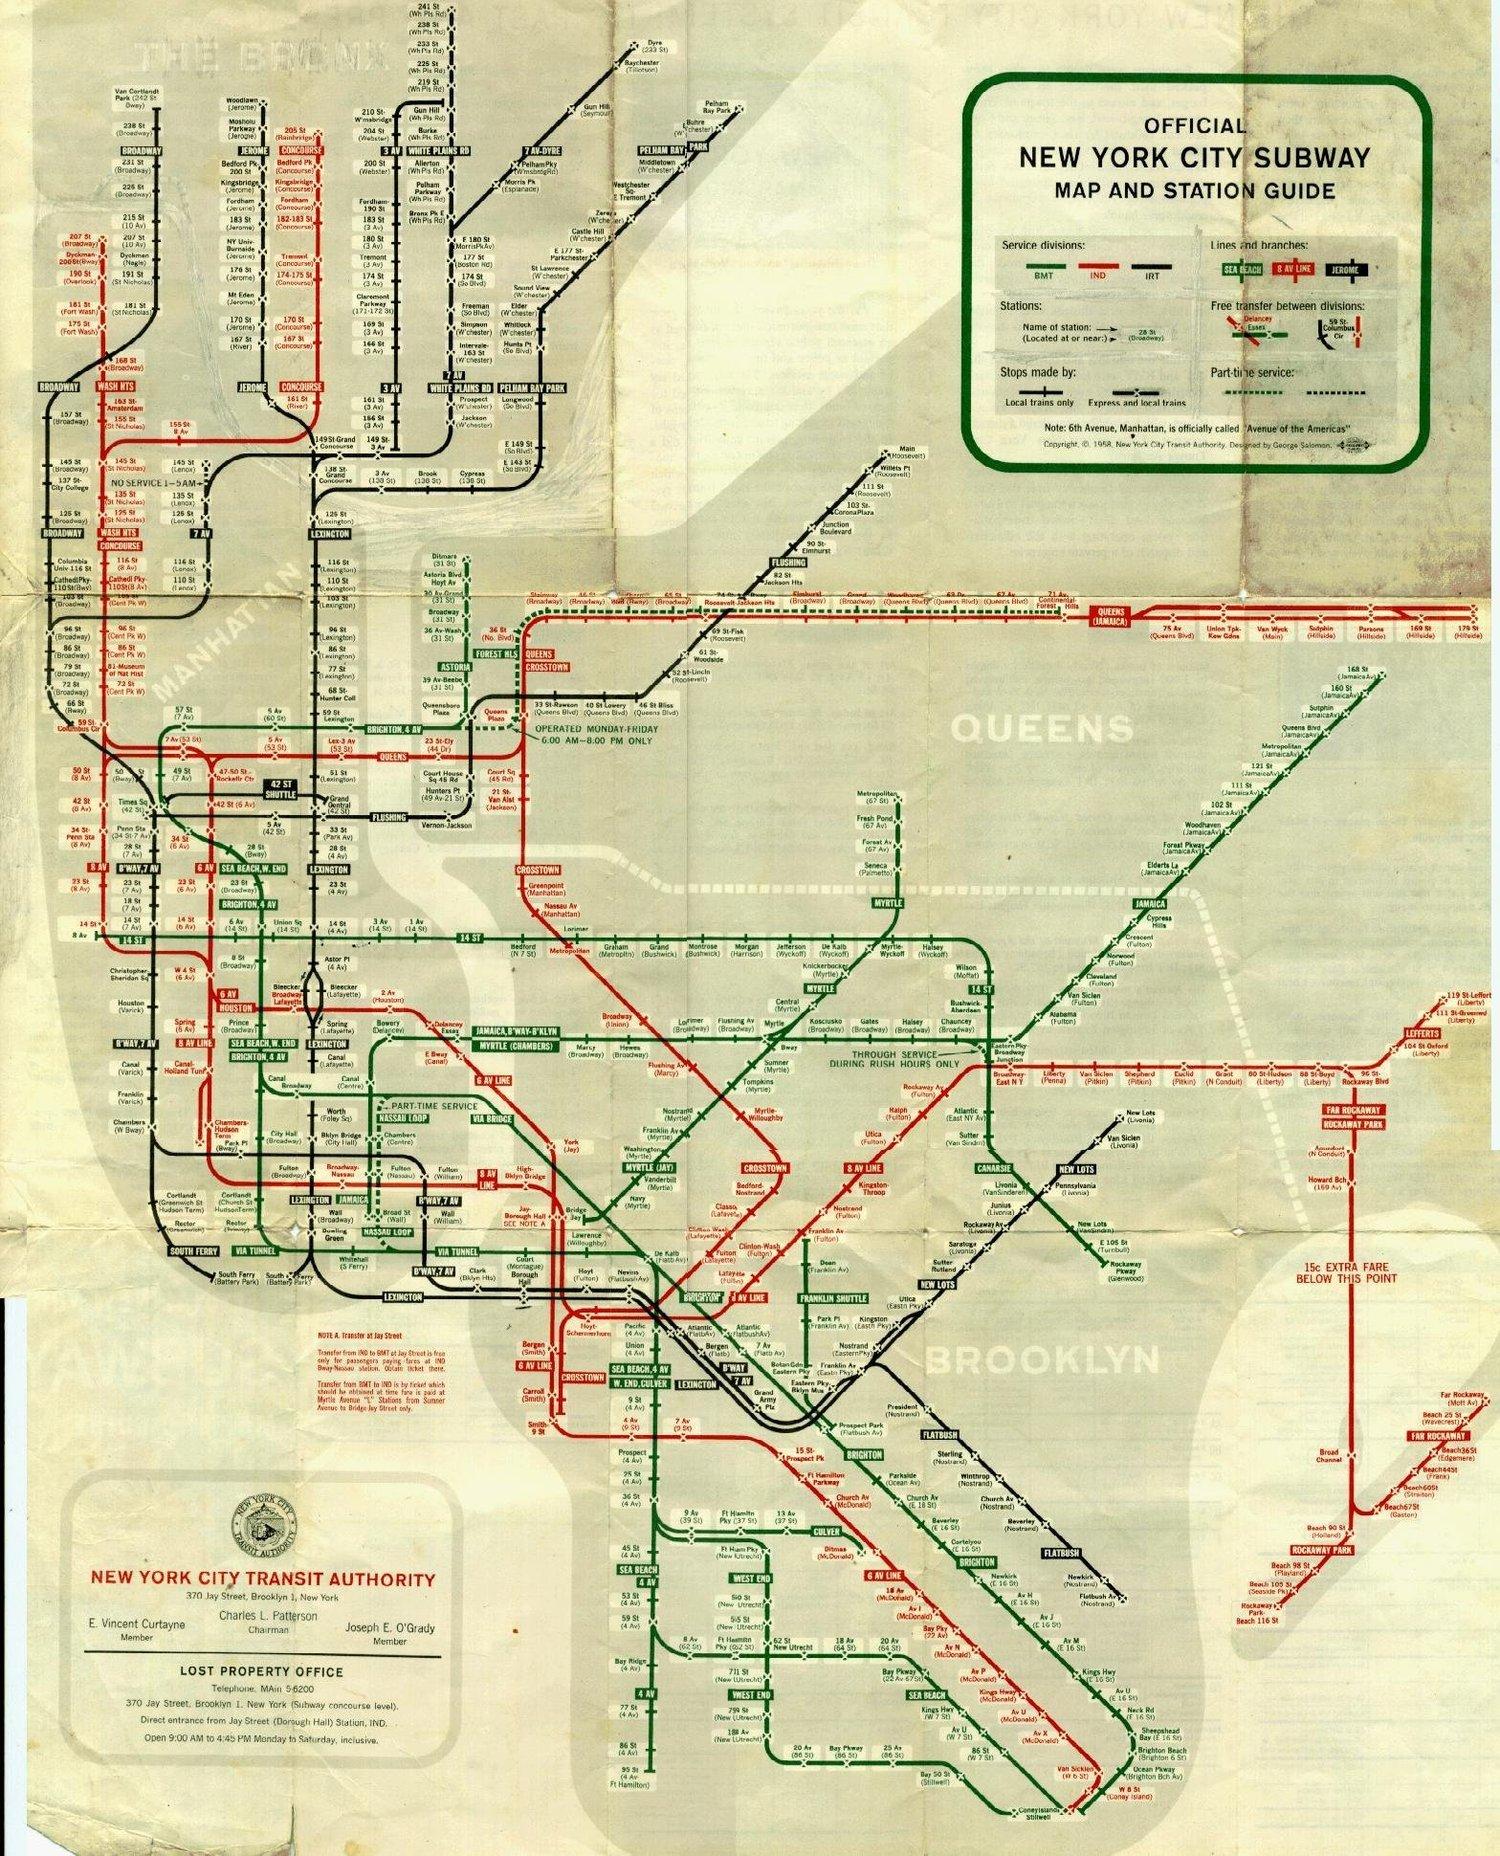 New York City Subway Map, 1958